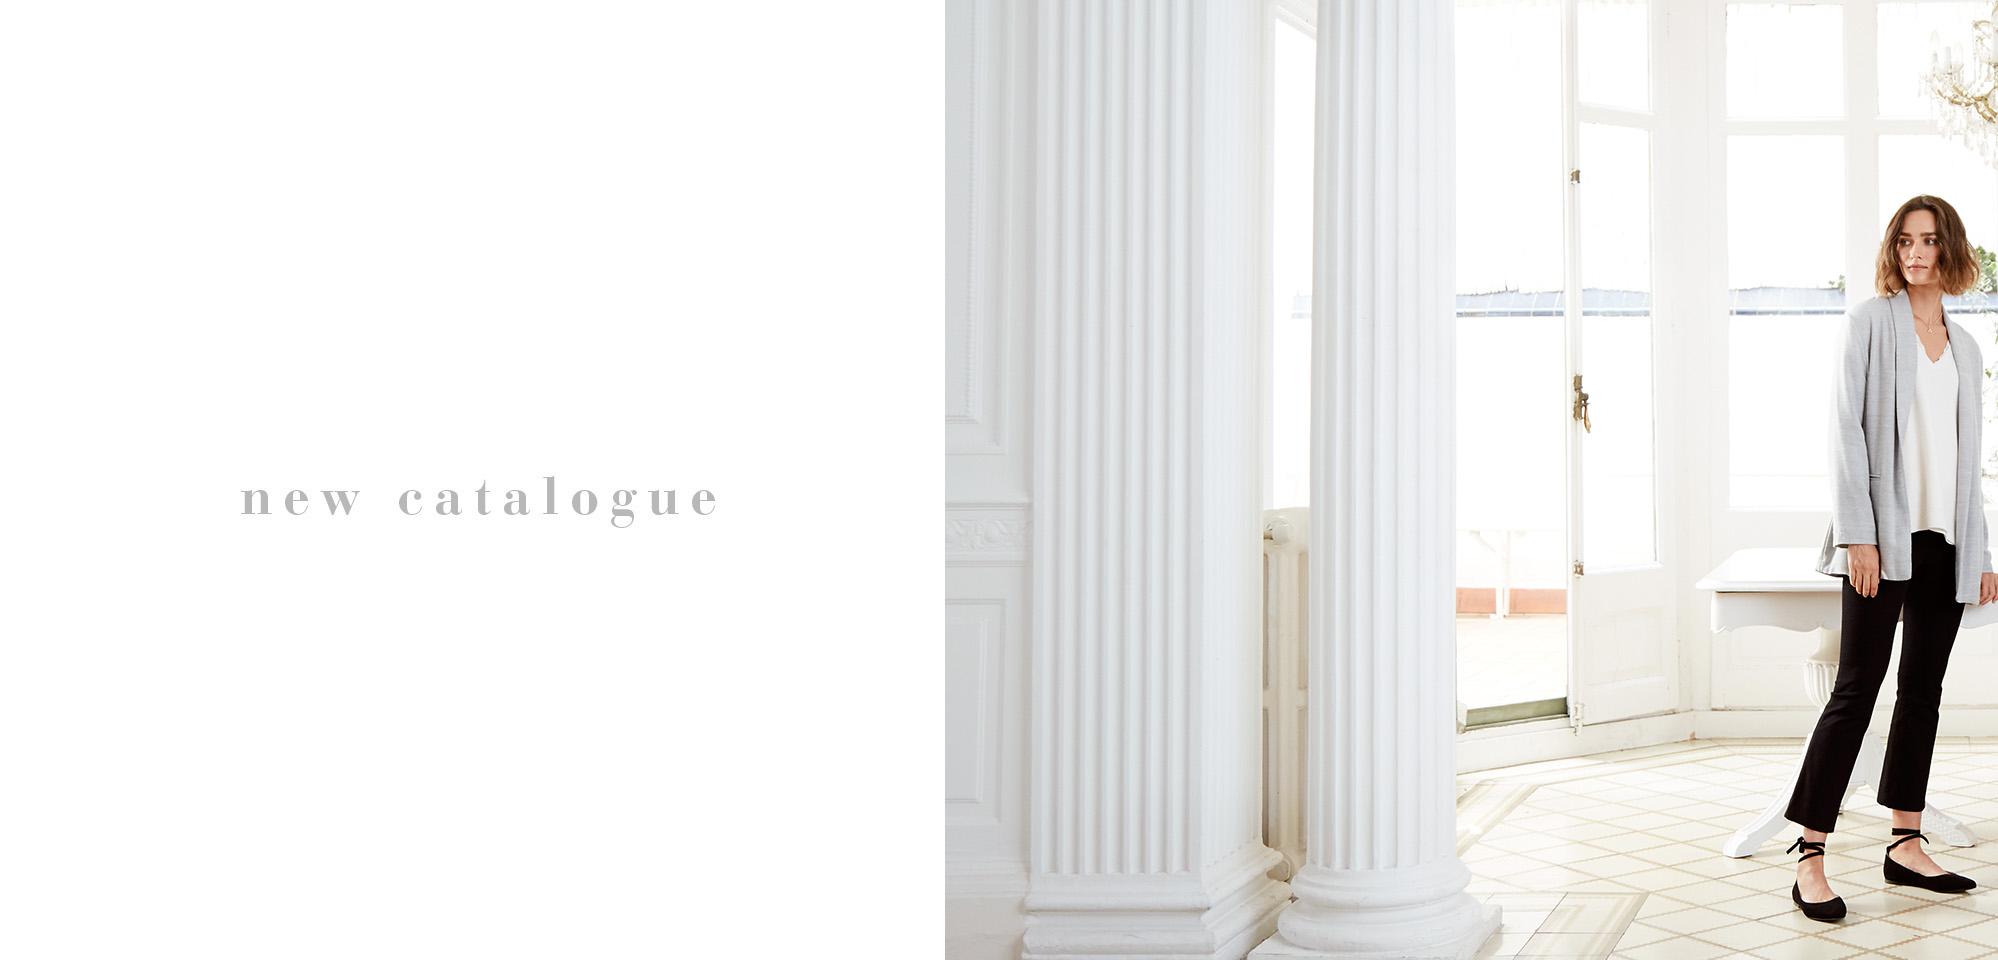 catálogo eseoese, eseoese catálogo, nueva temporada, new season, catálogo otoño-invierno